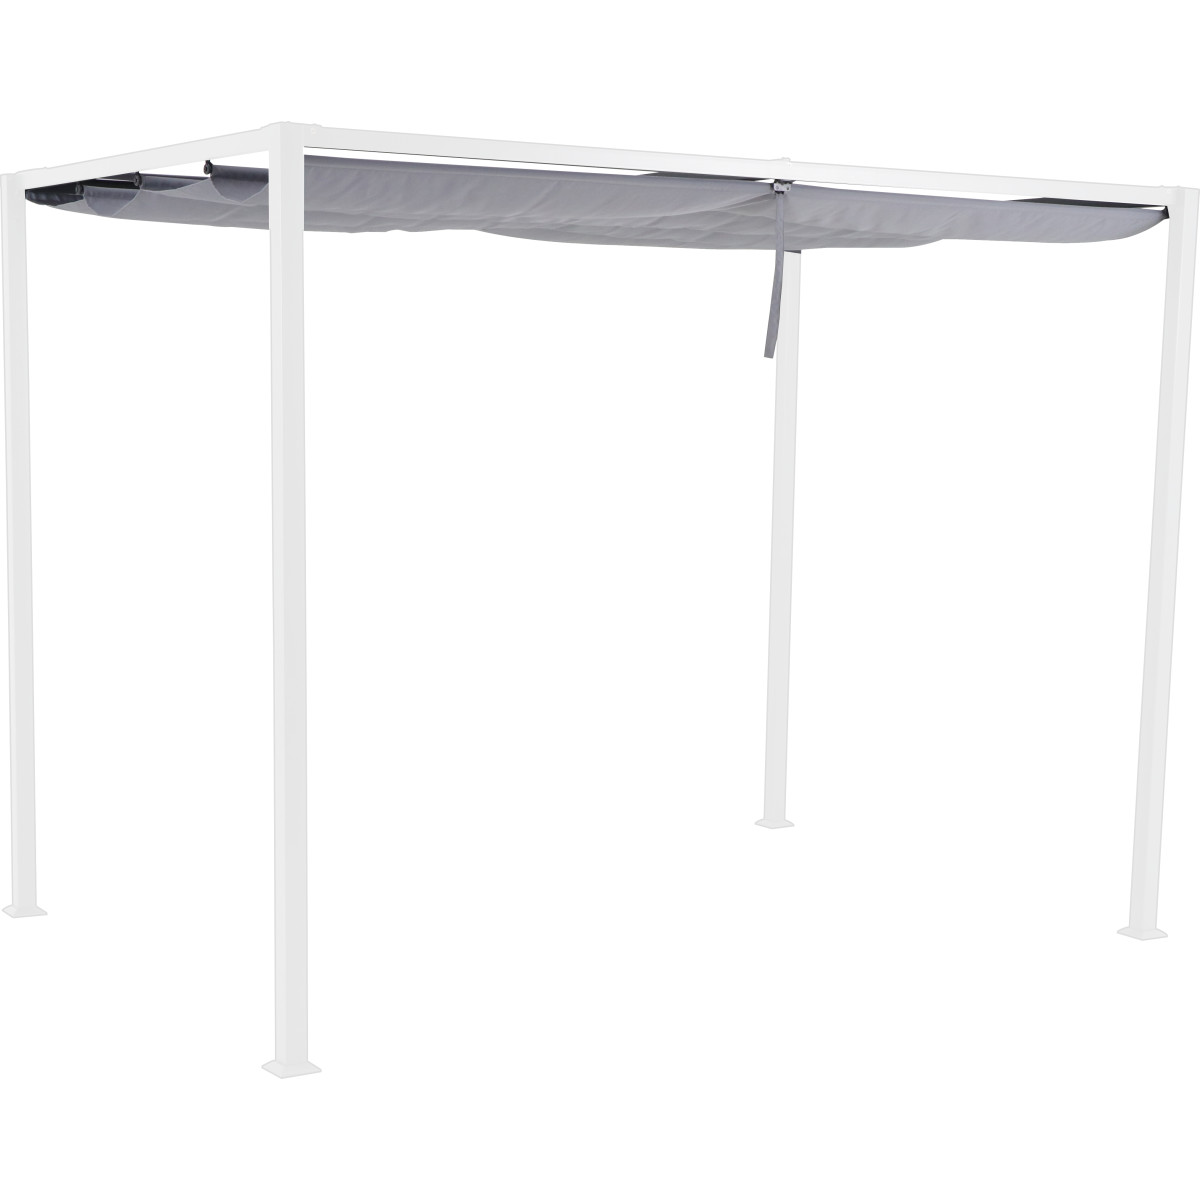 Навес для перголы Horali 2x3 м цвет серый